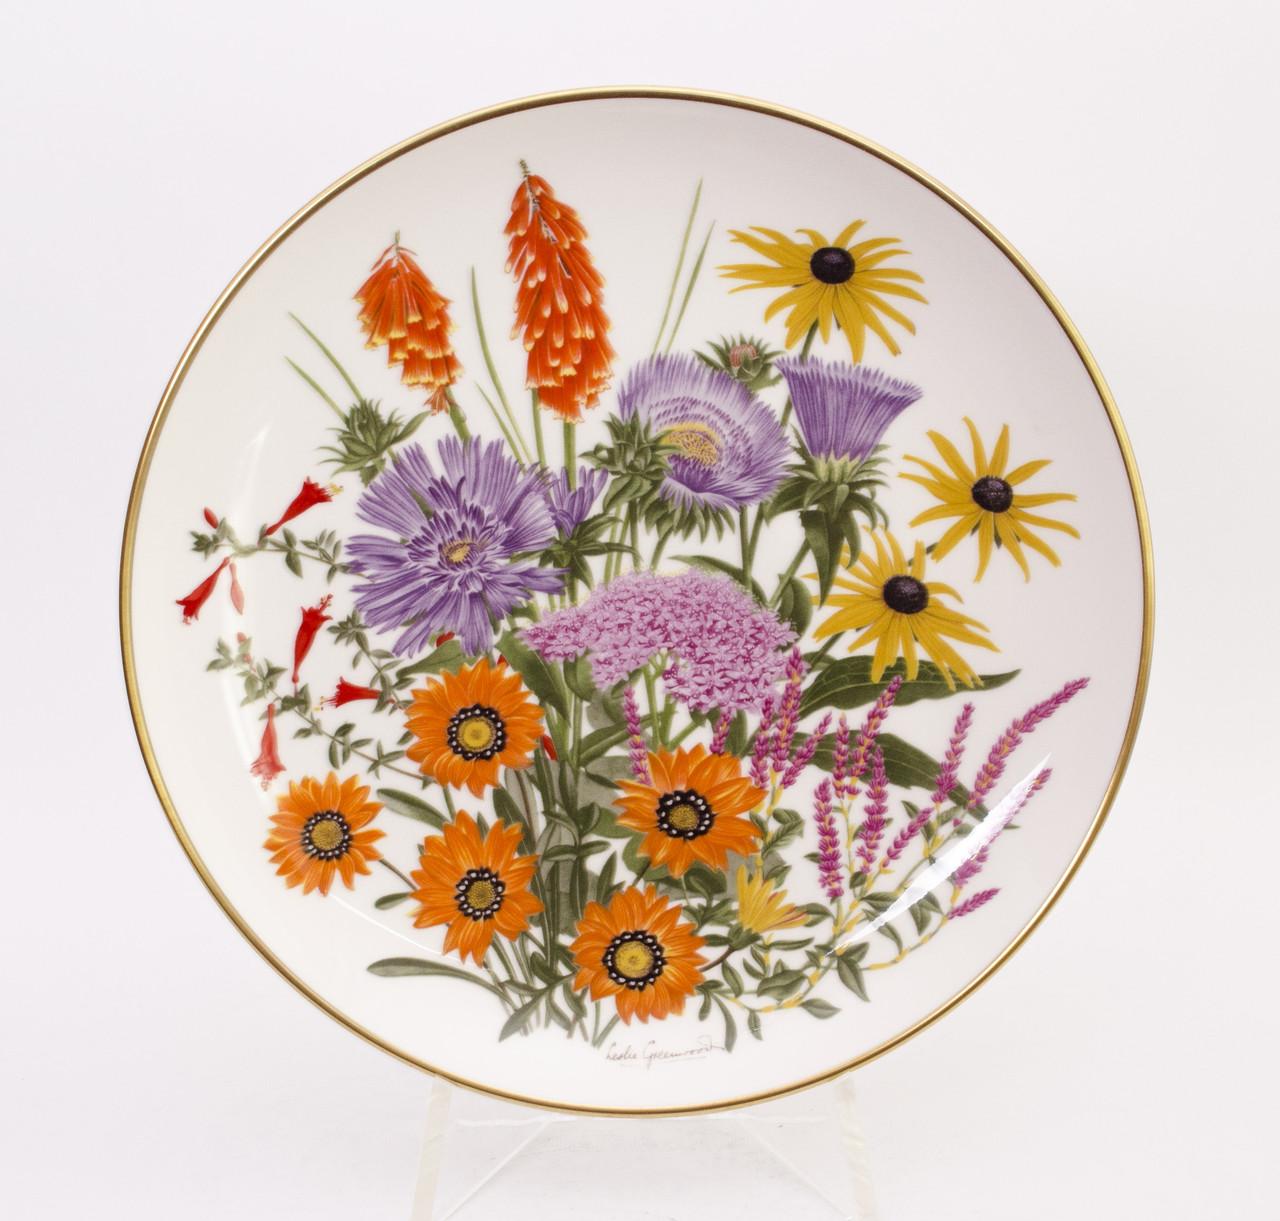 Тарелка коллекционная FRANKLIN PORCELAIN фарфор Англия, сентябрь